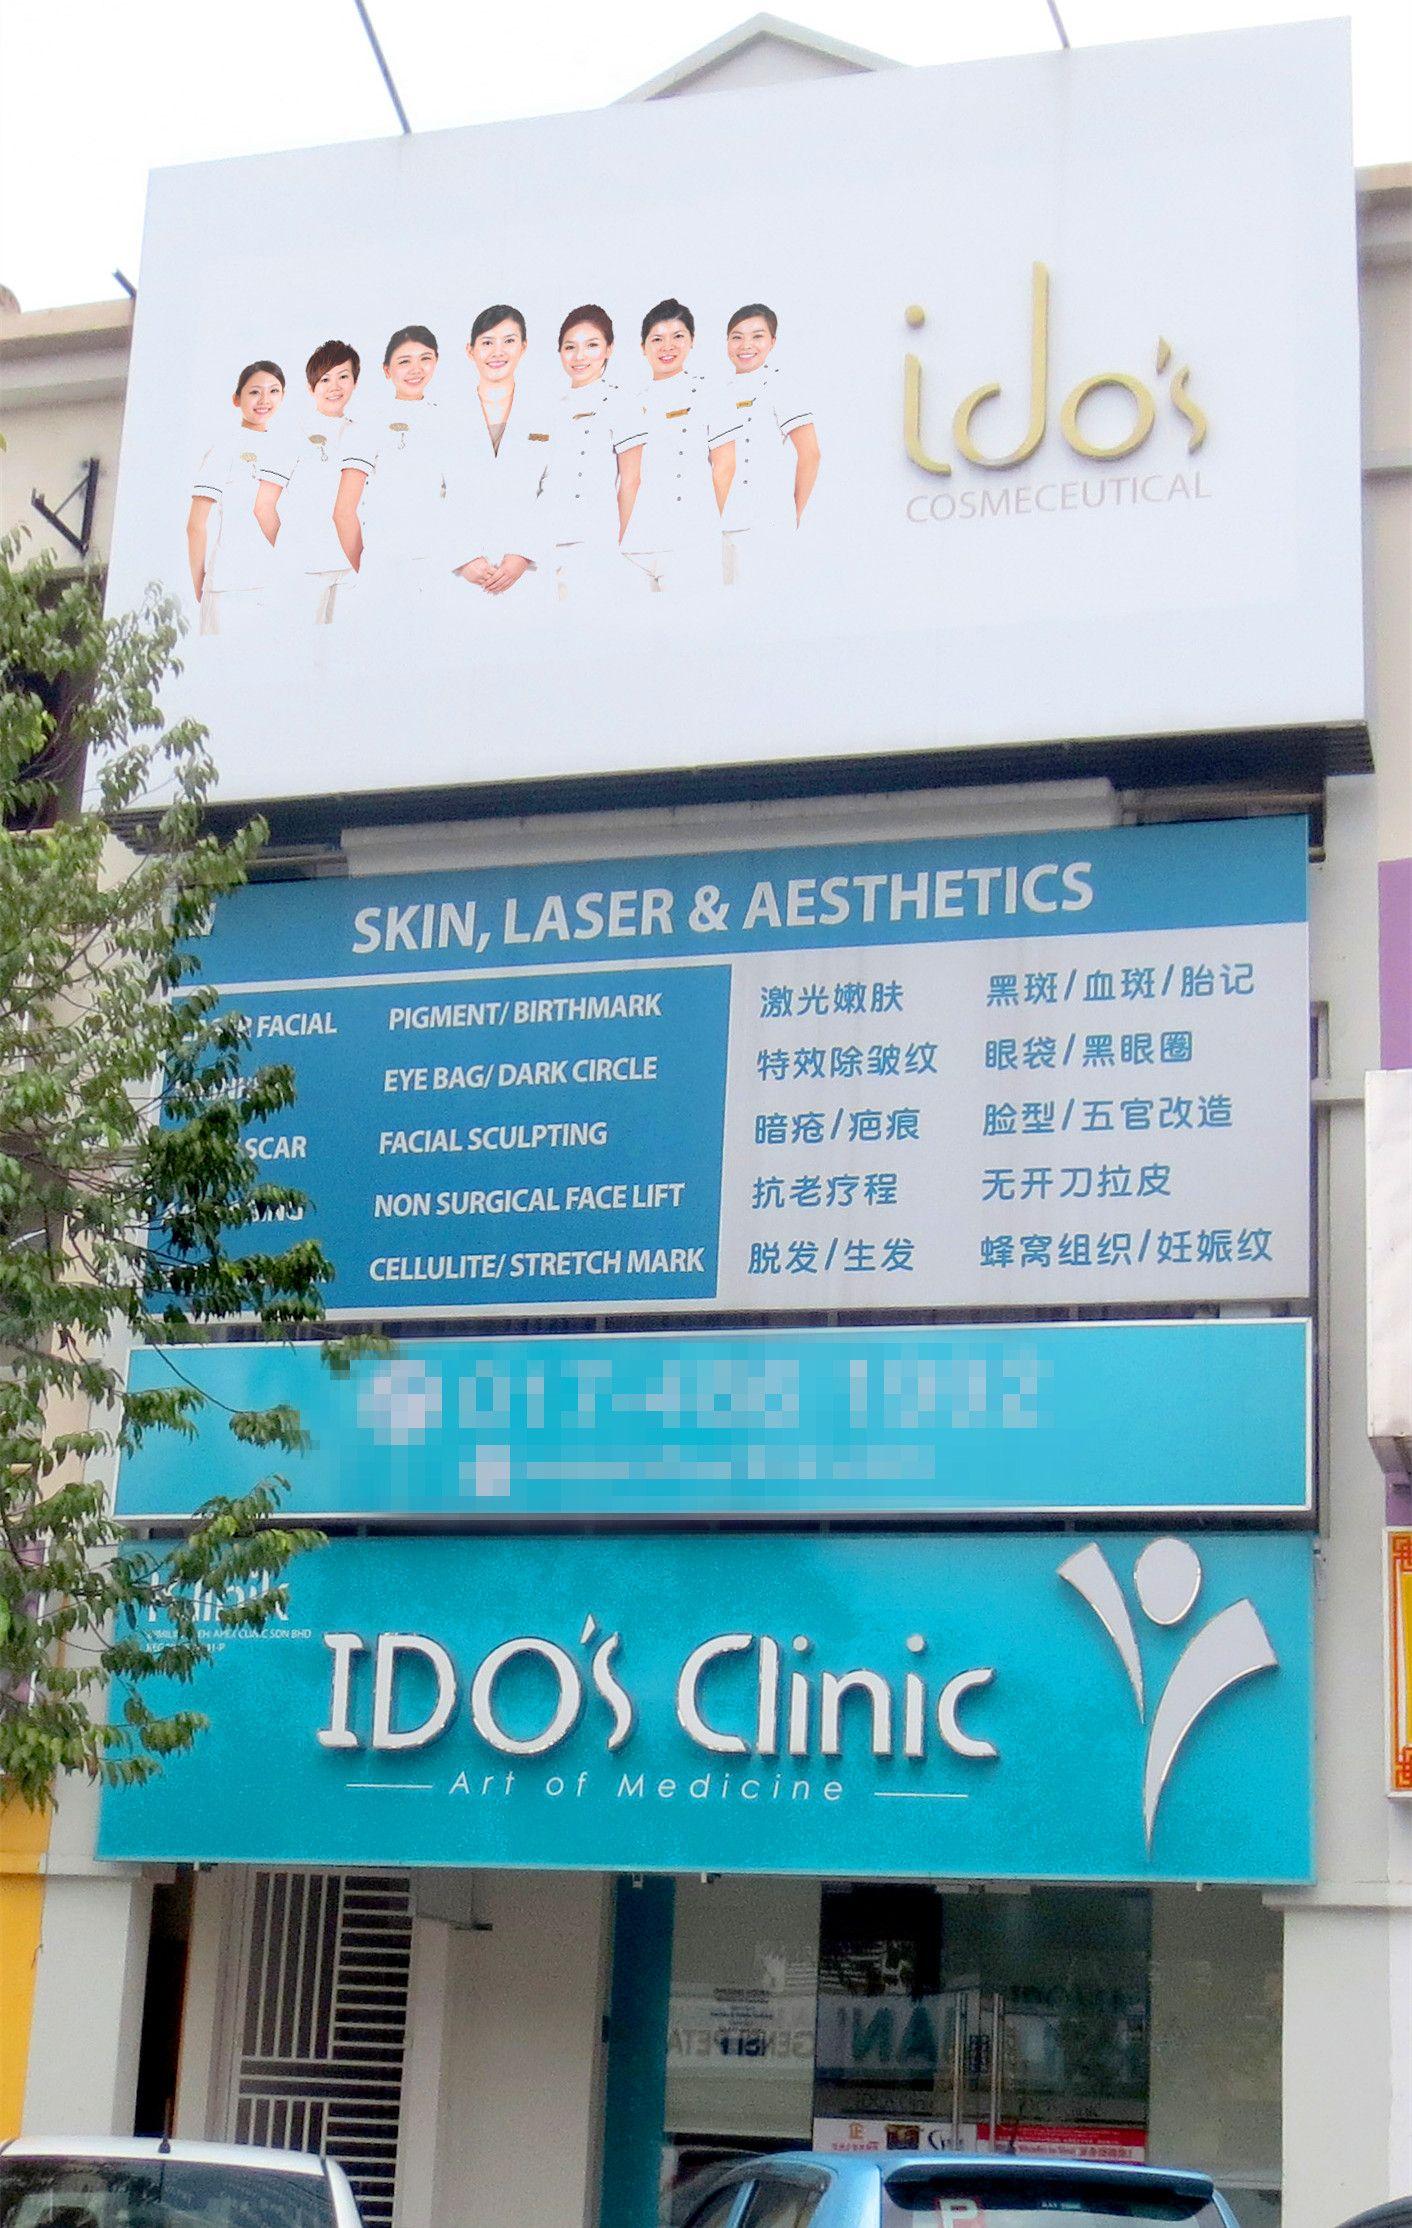 IDO'S Clinic - Kota Damansara, Selangor Branch